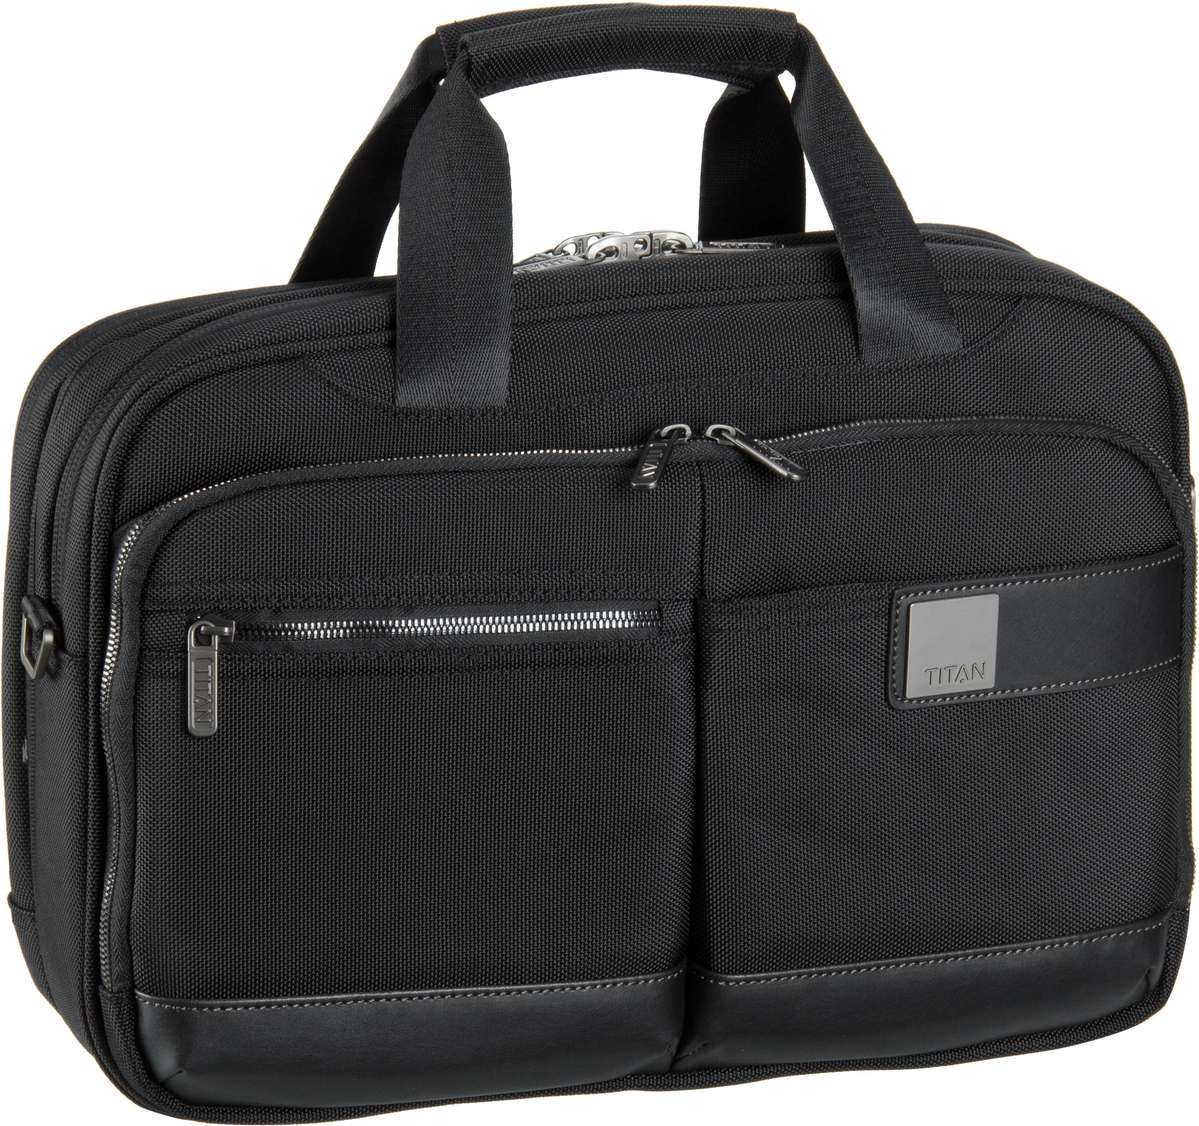 Titan Power Pack Laptop Bag S Black - Aktentasche